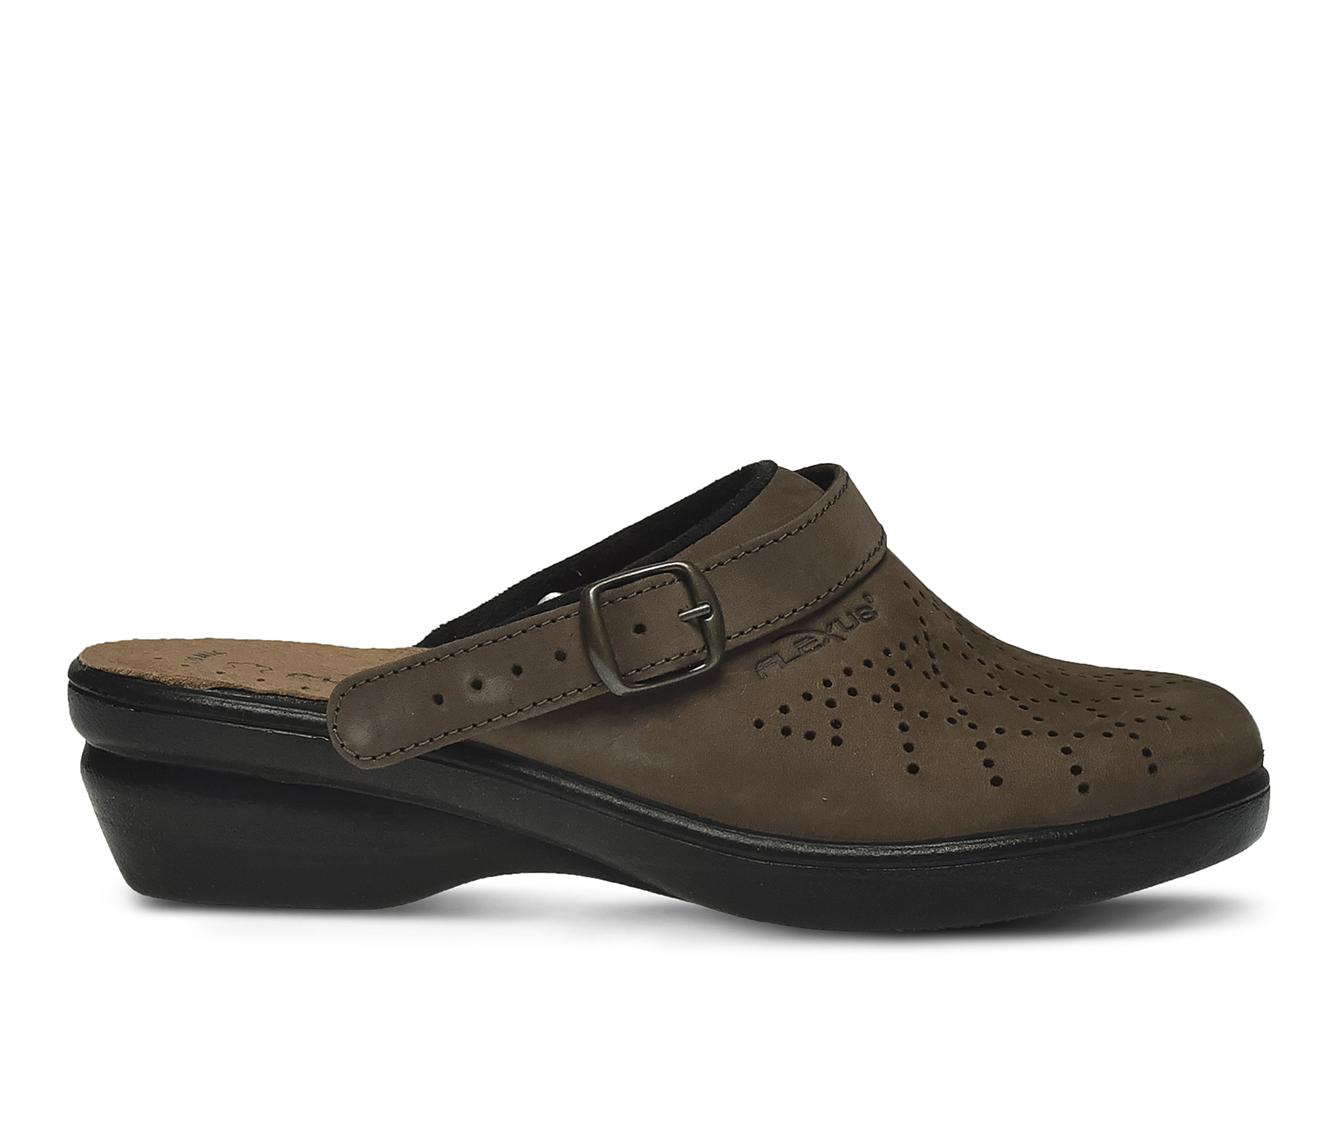 Flexus Pride Women's Shoe (Brown Faux Leather)